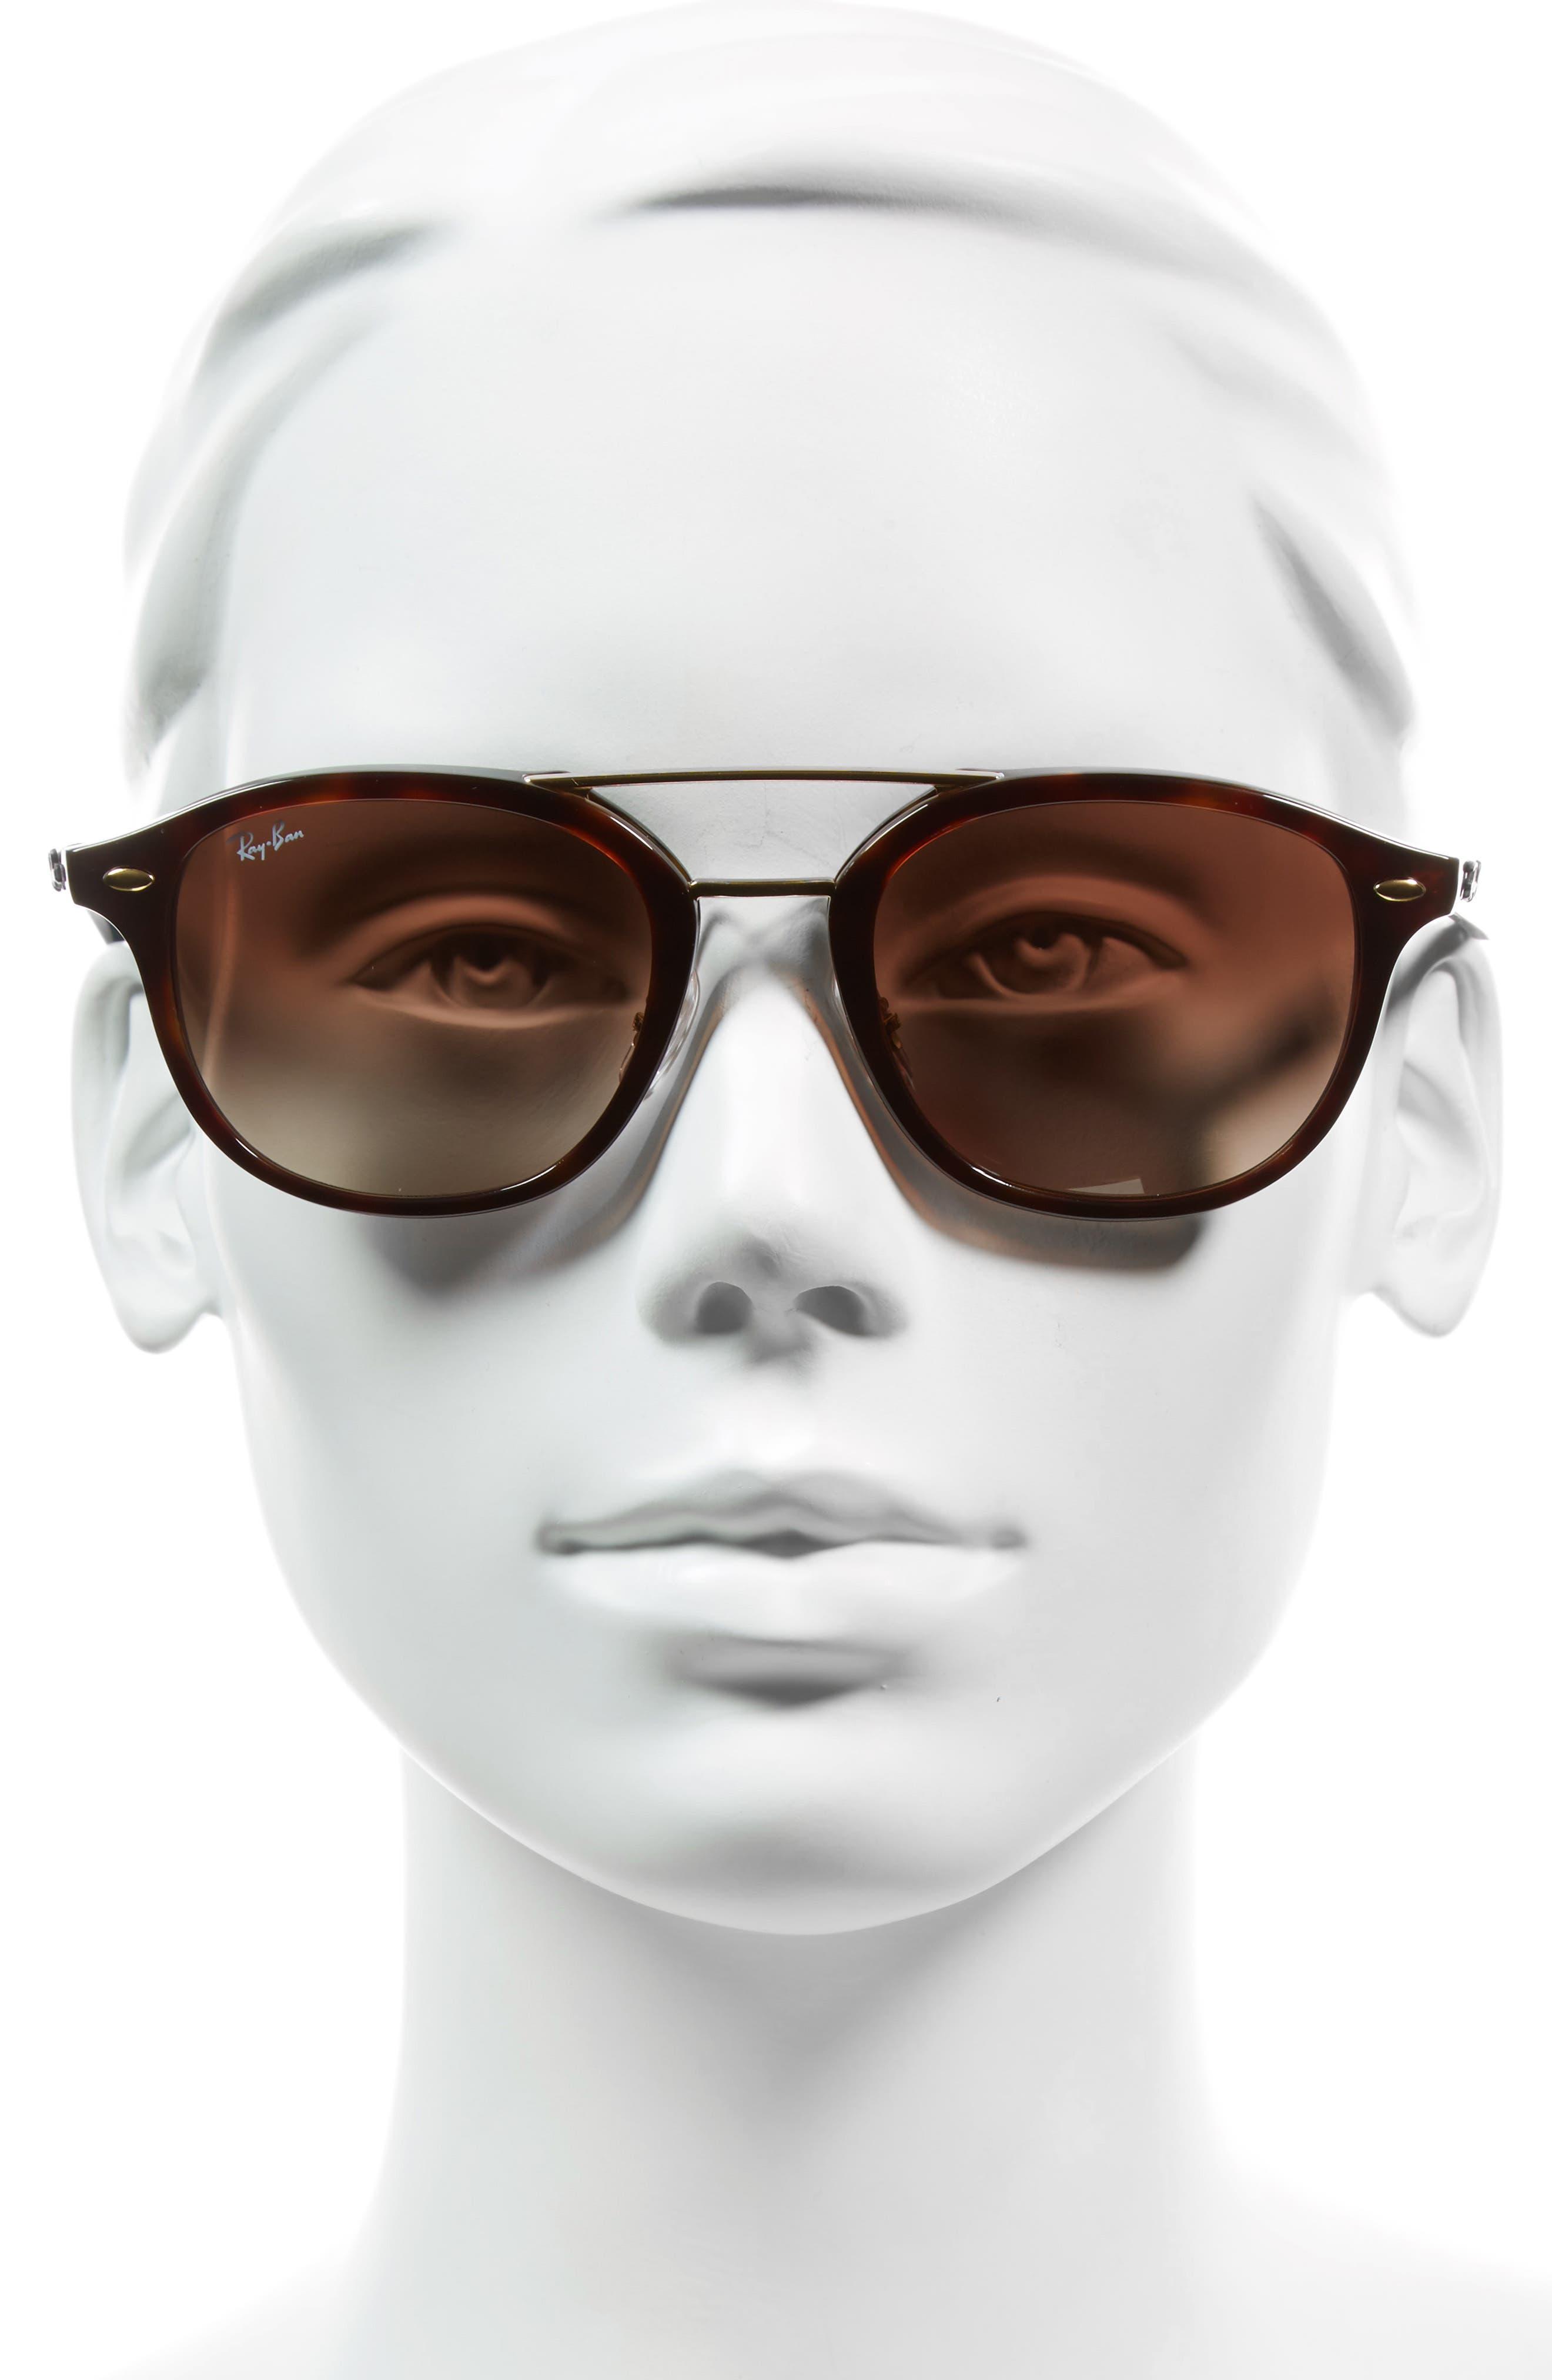 53mm Aviator Sunglasses,                             Alternate thumbnail 2, color,                             905